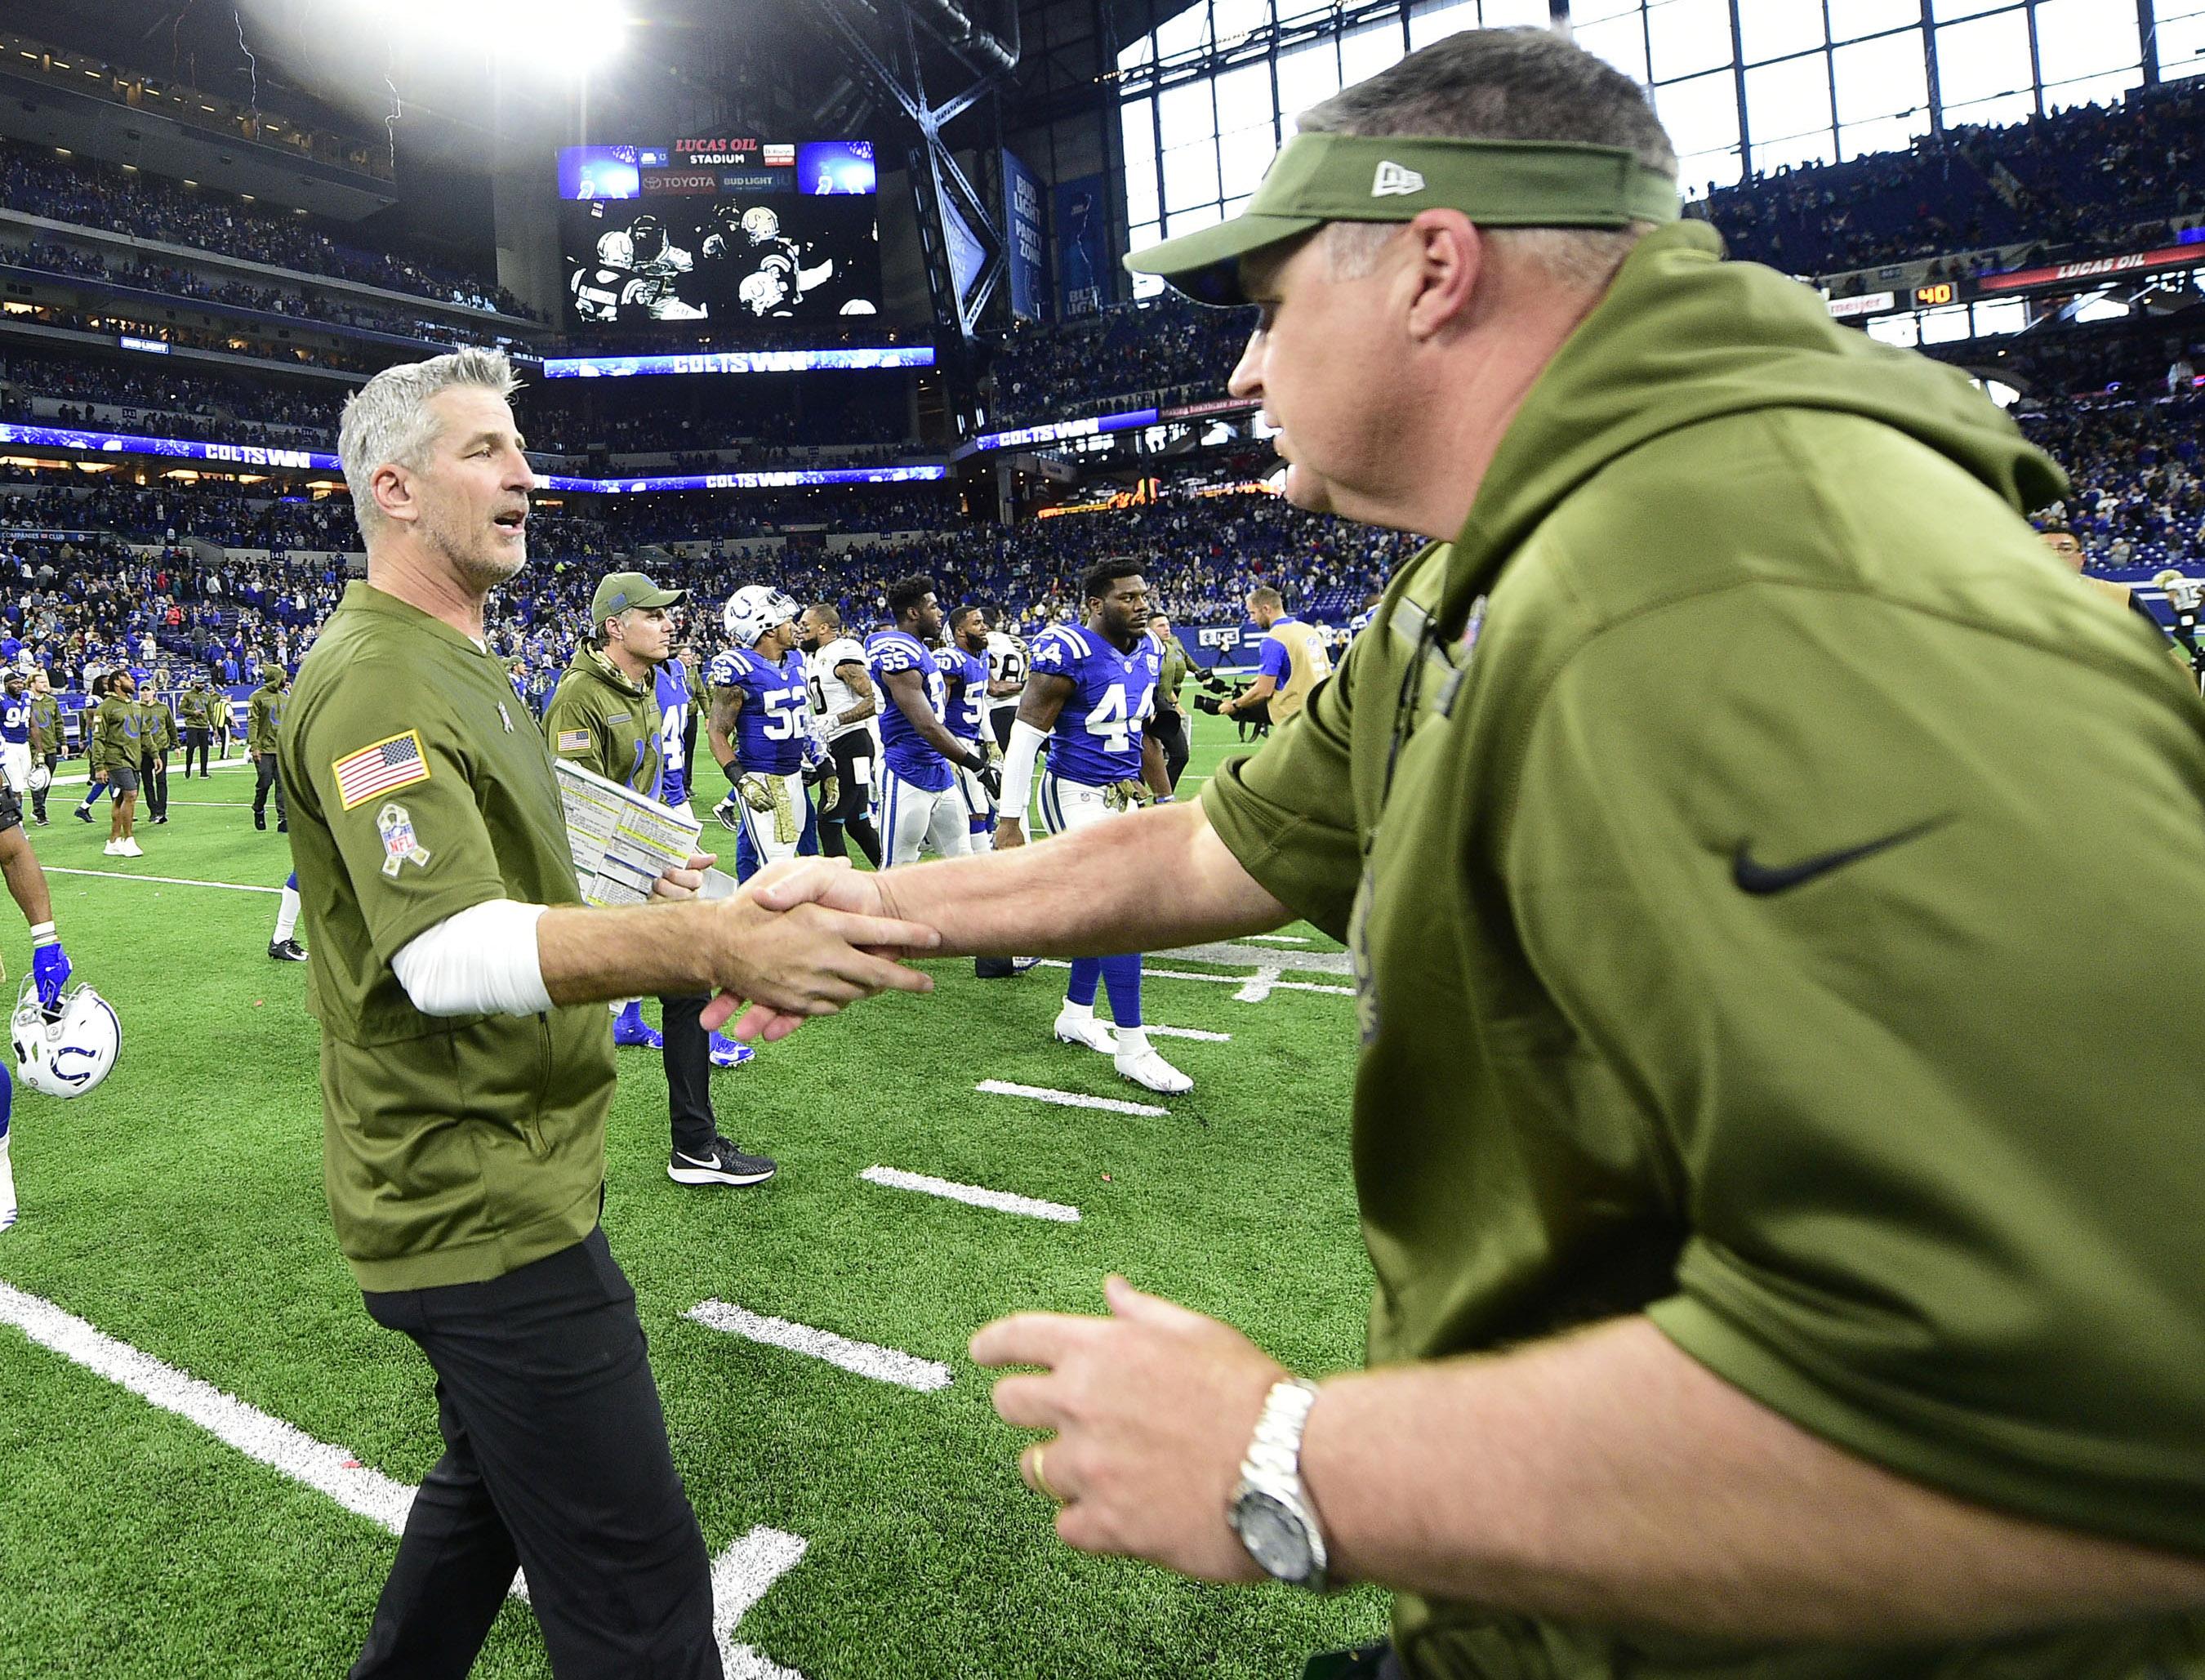 NFL: Jacksonville Jaguars at Indianapolis Colts